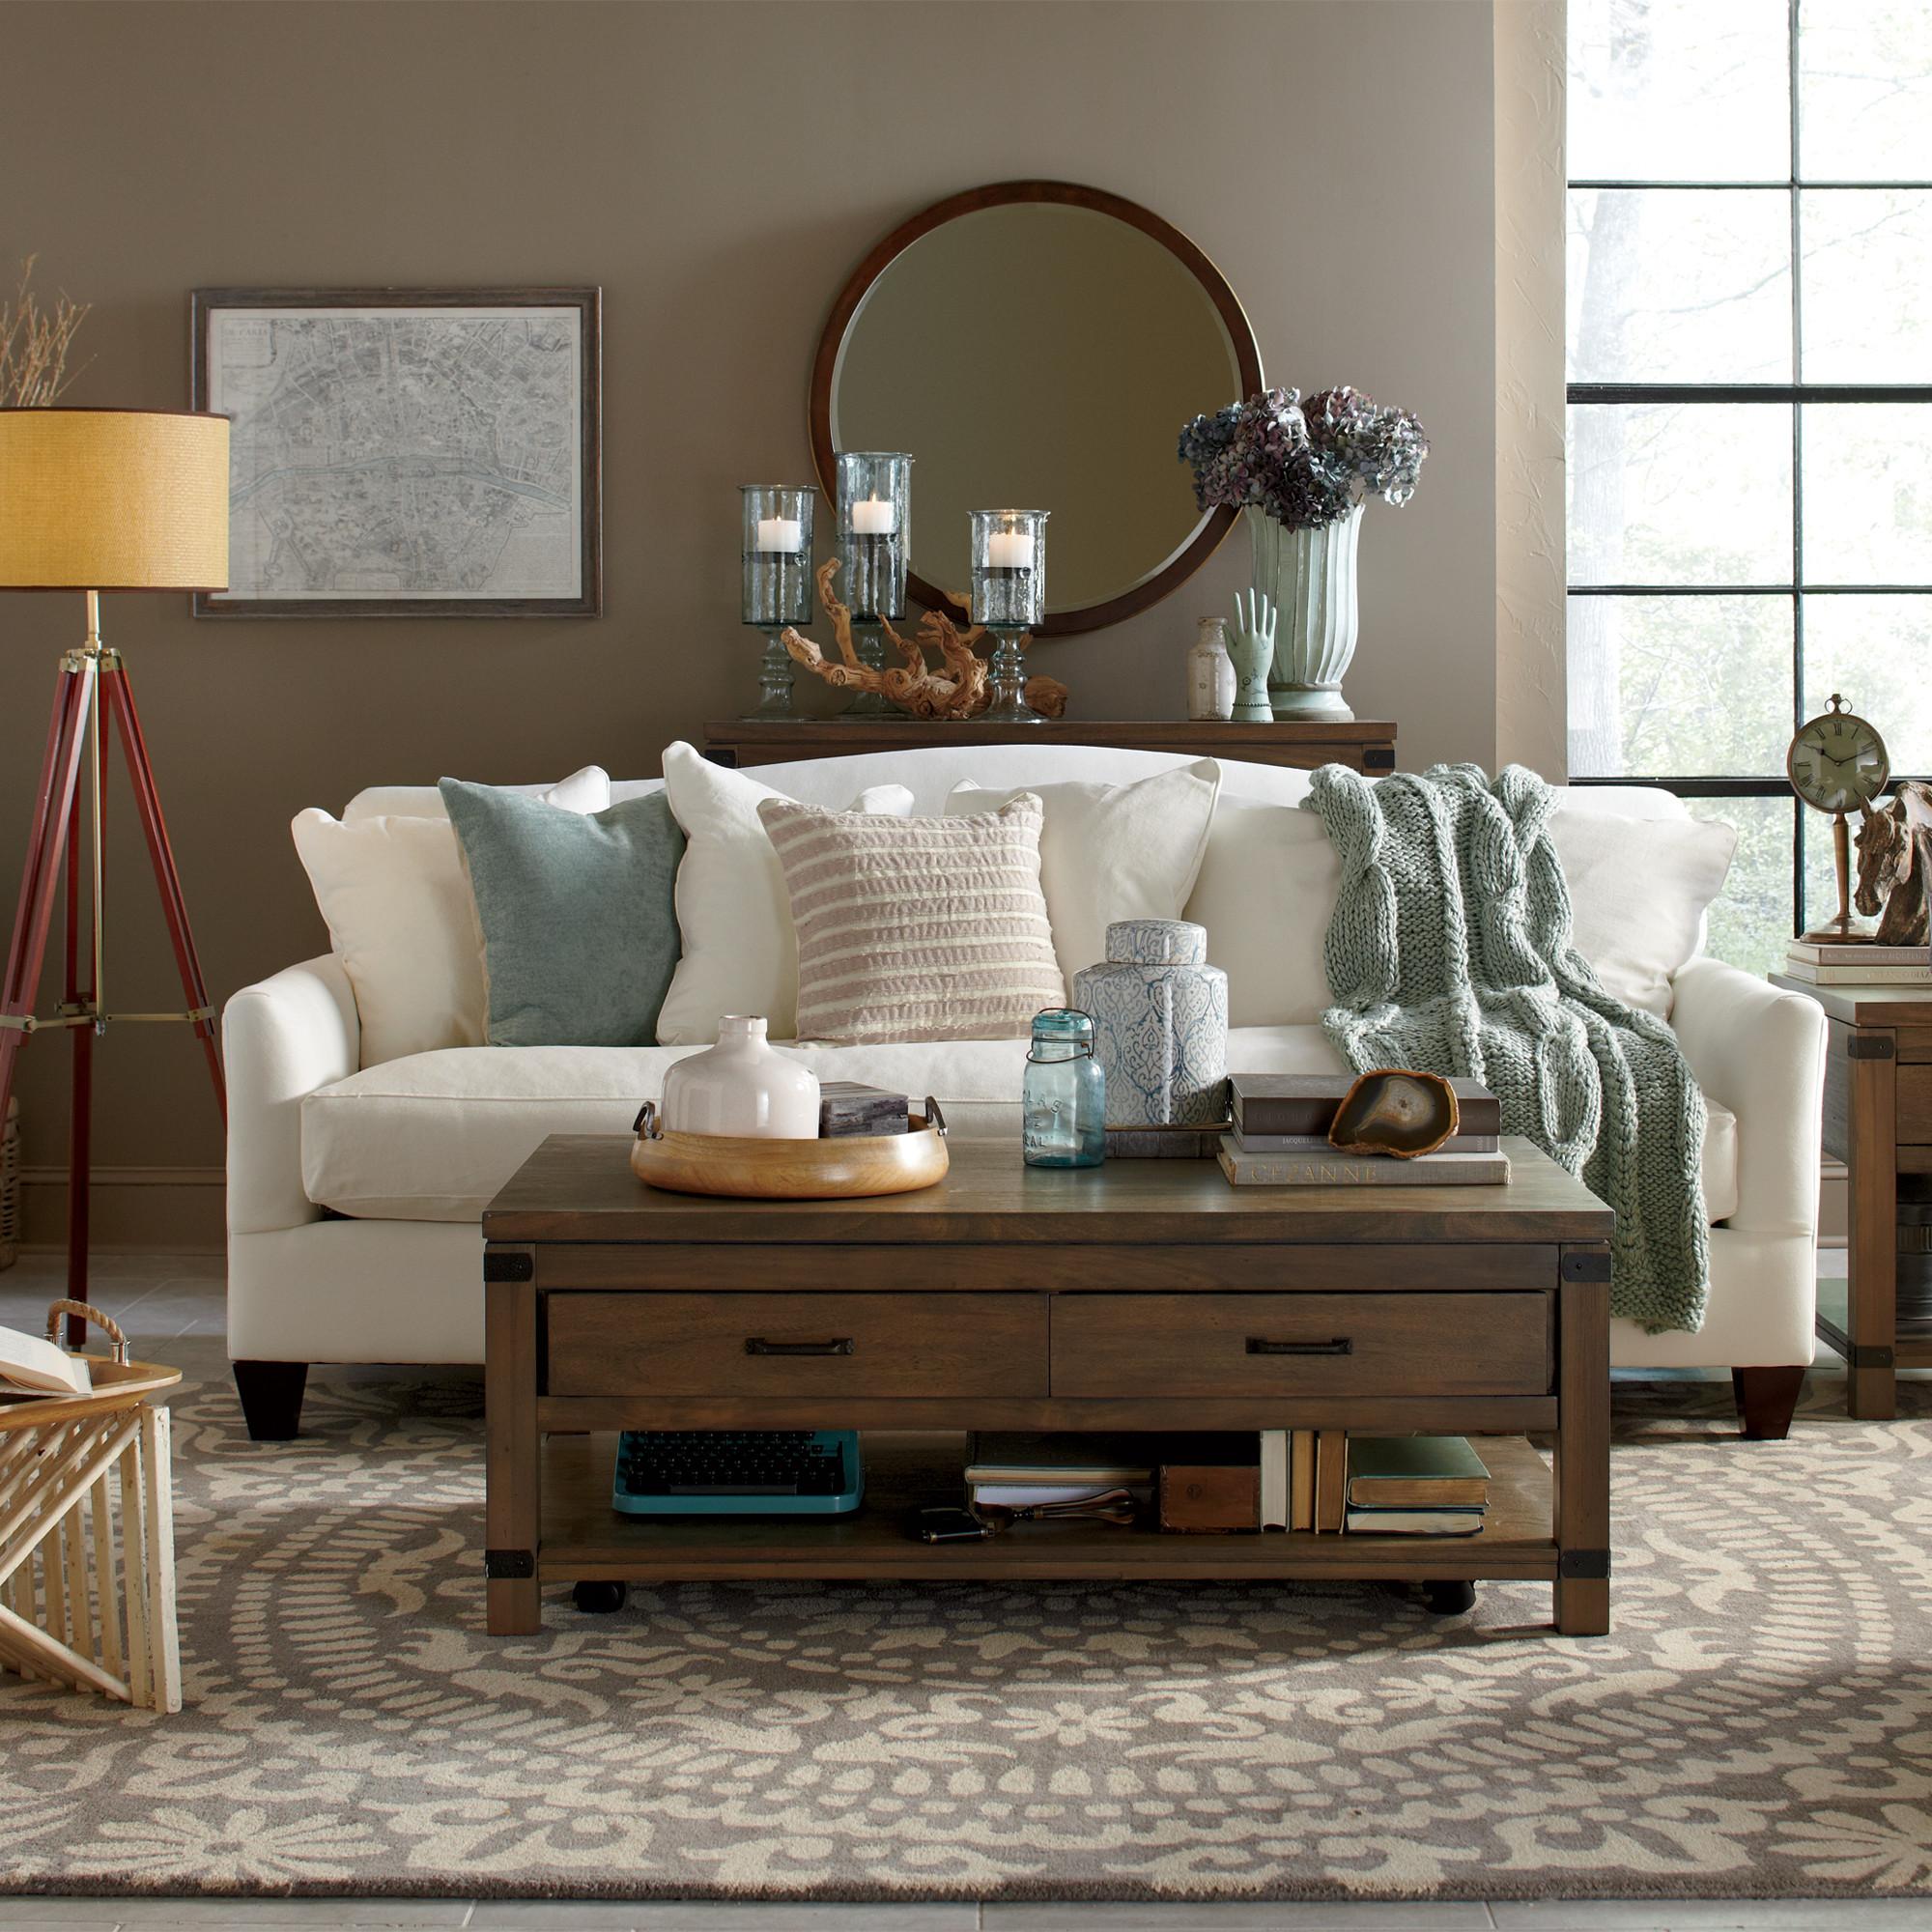 Merveilleux Fixer Upper Shotgun House Sofa